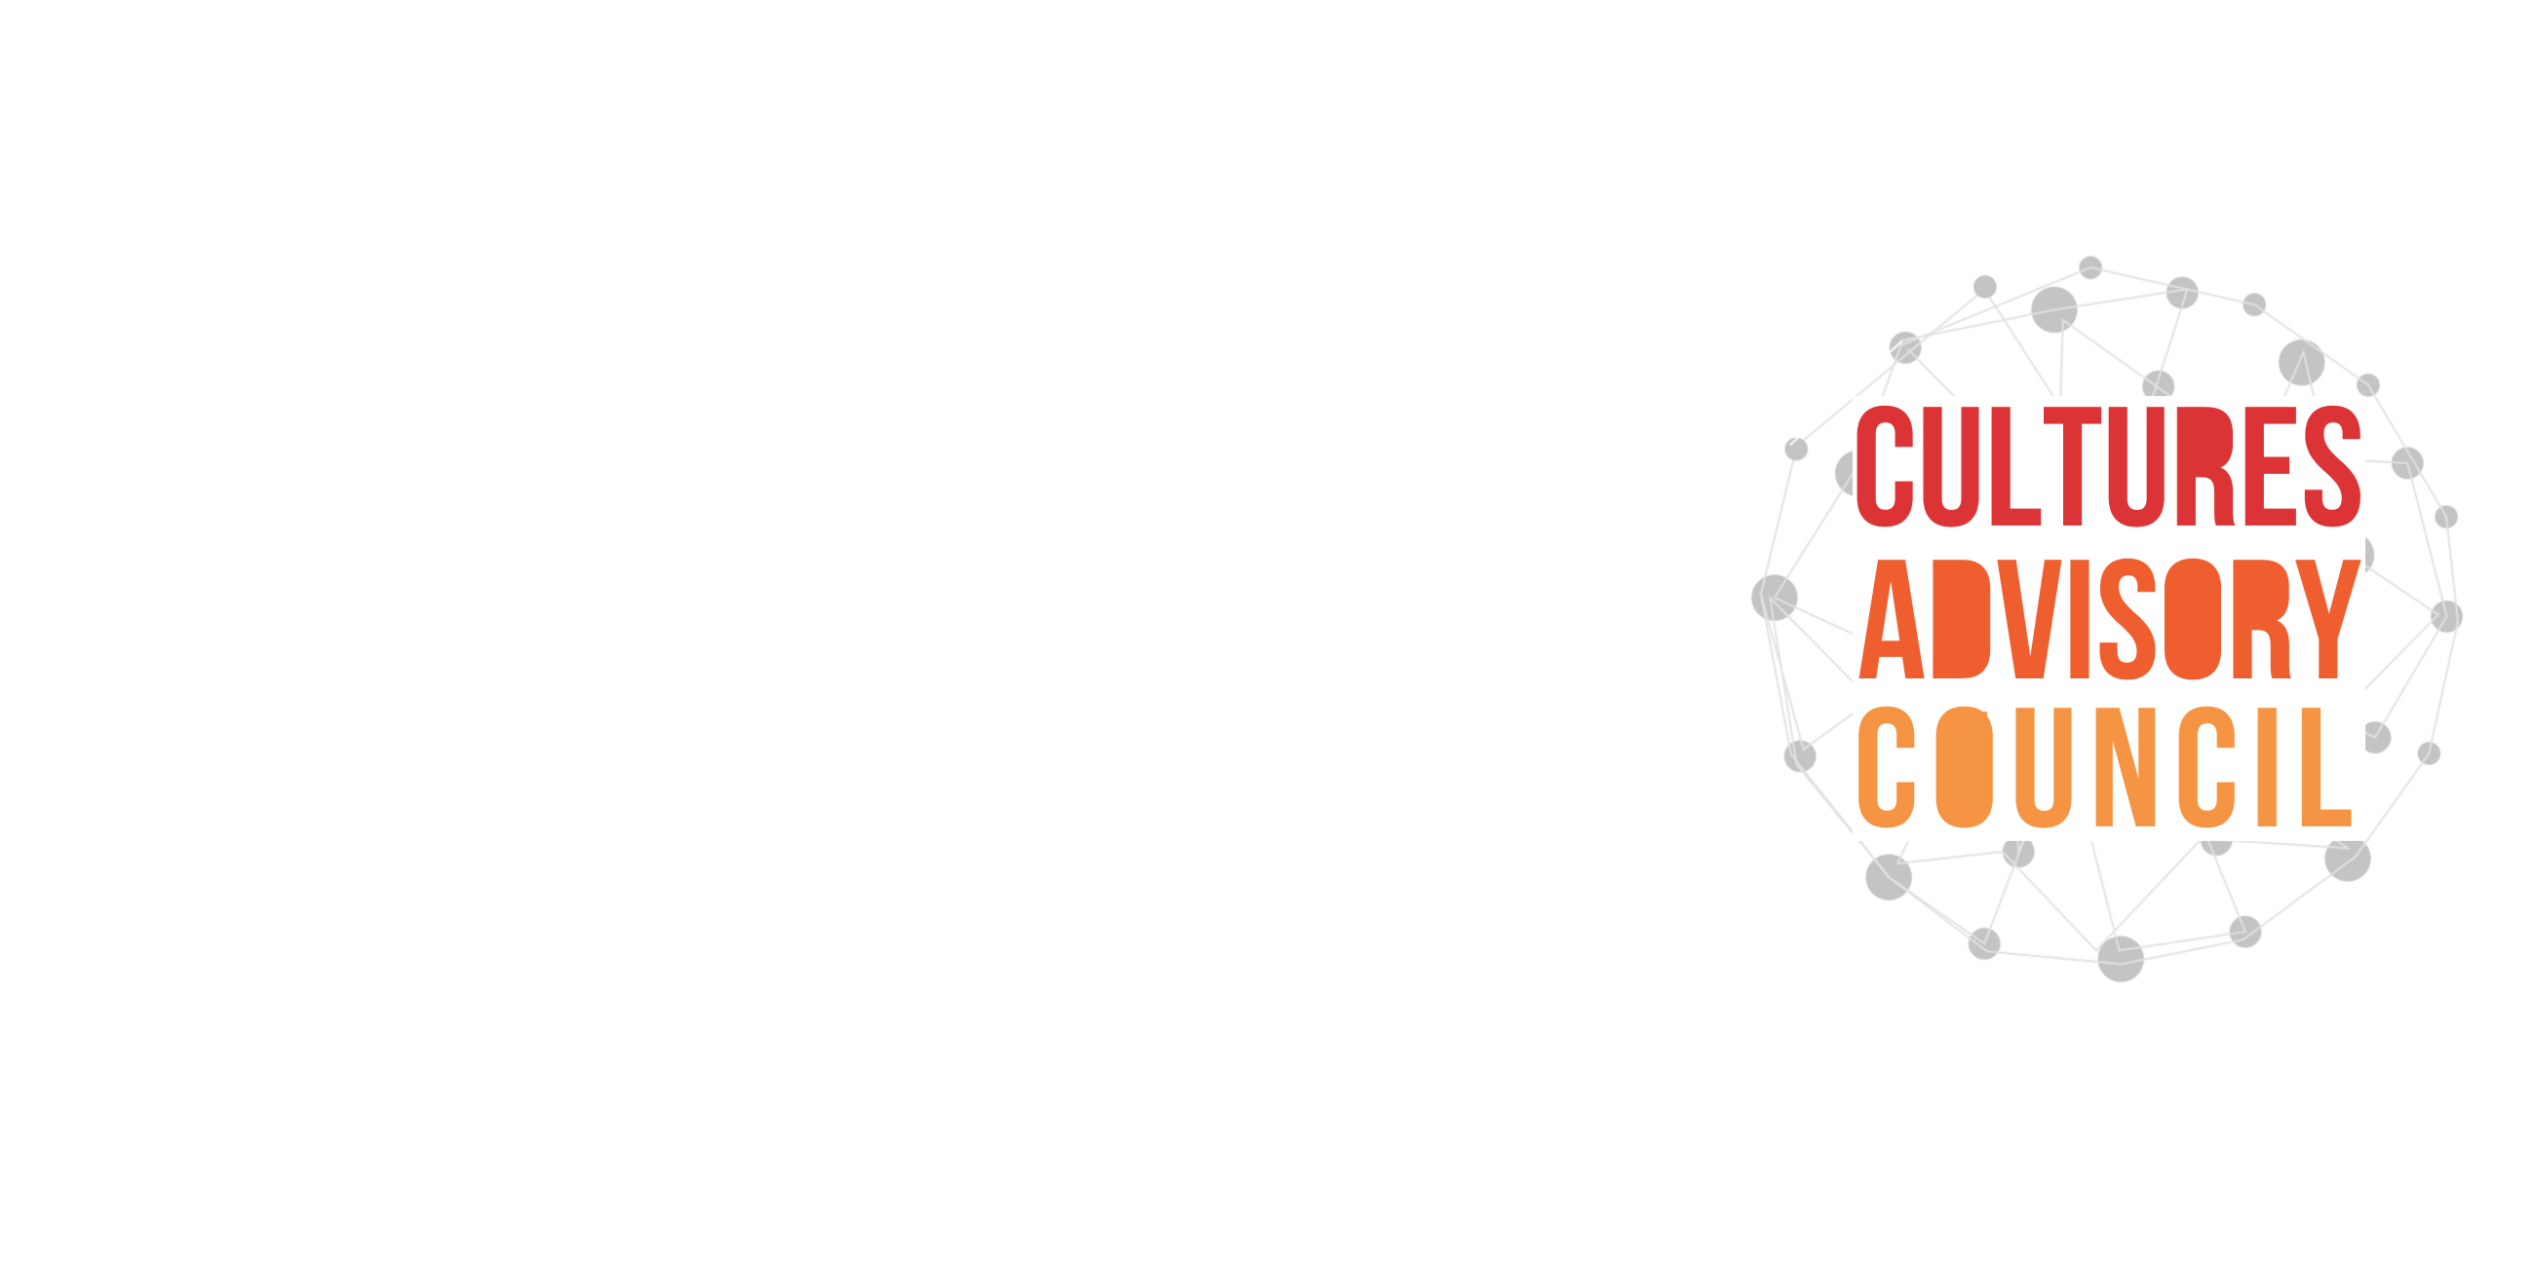 Meet The 2018 Cultures Advisory Council